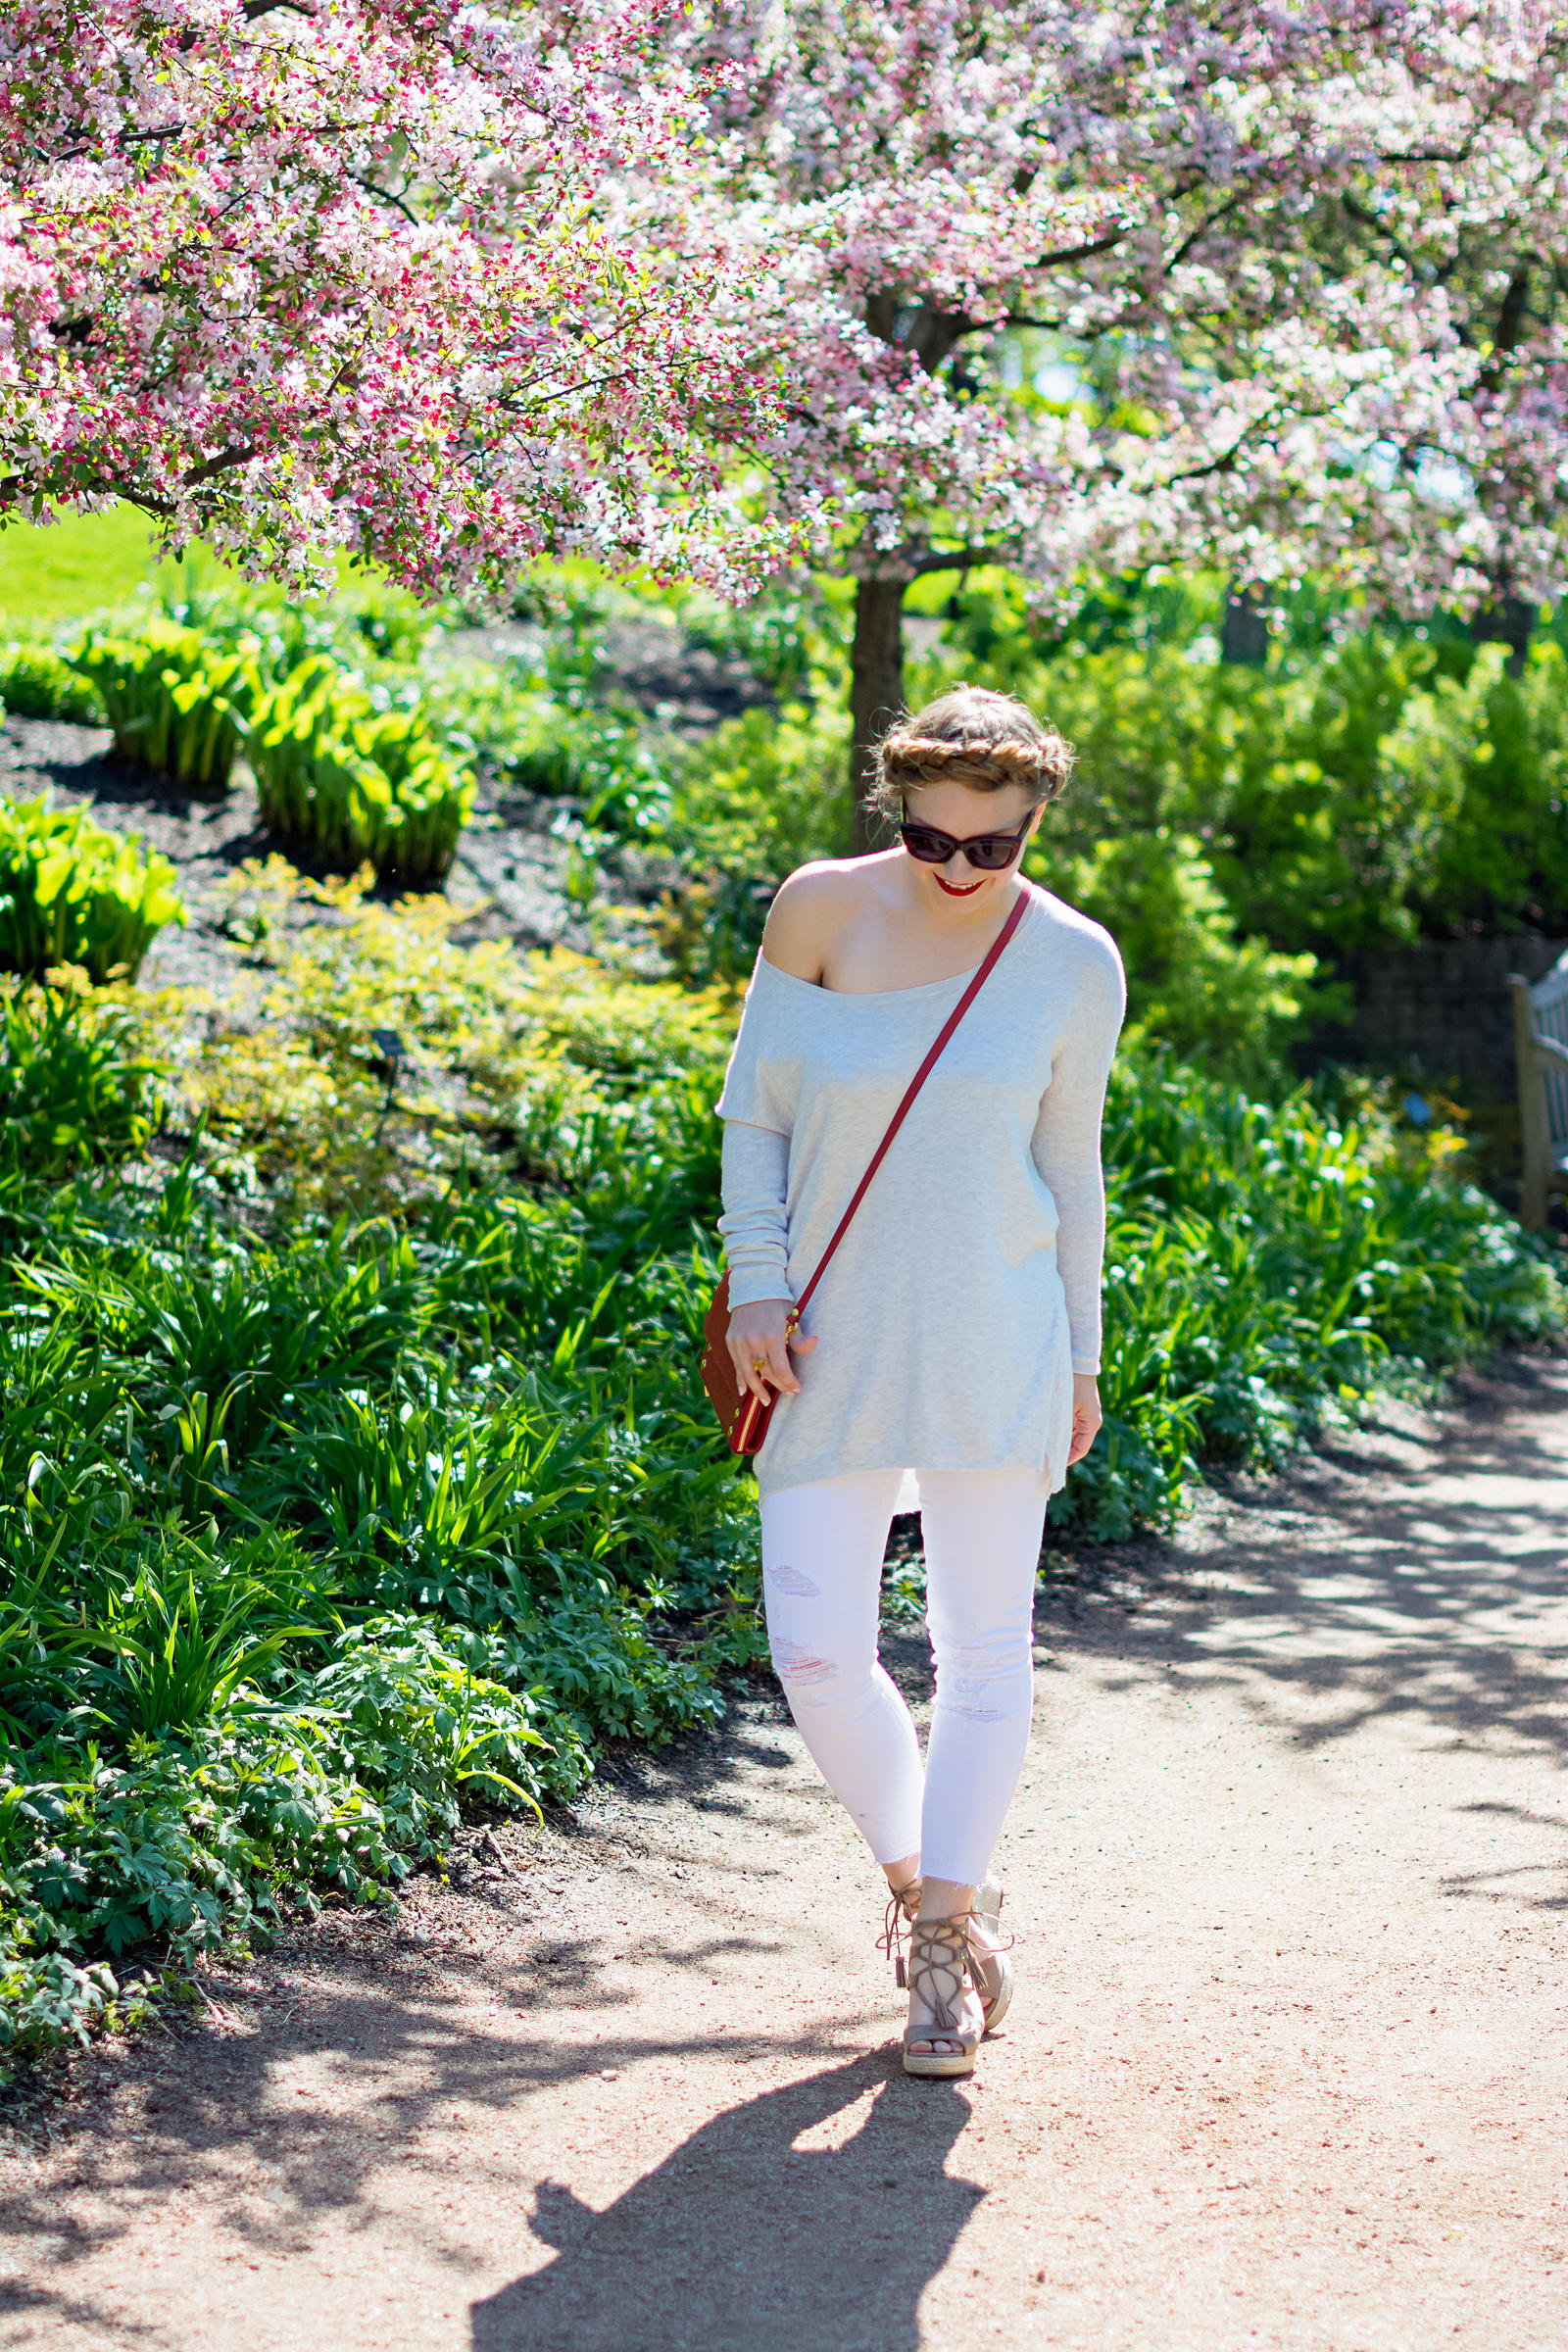 Hammitt Lucas Bag Lace-Up Wedges Summer Outfit